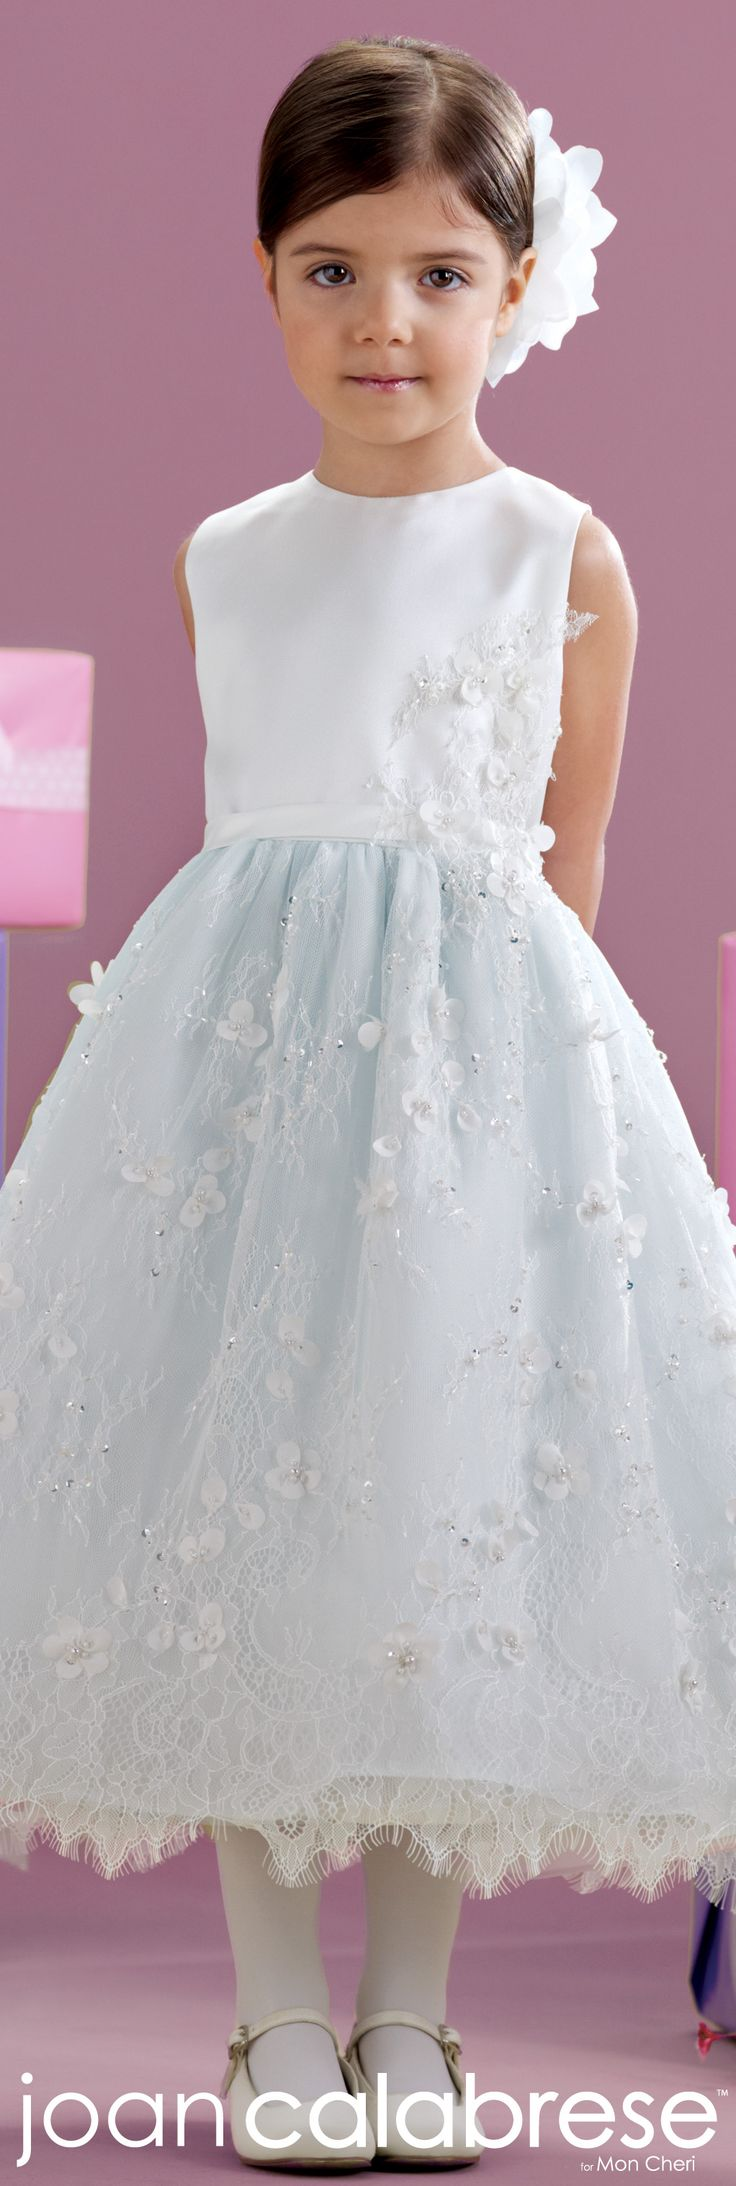 Joan Calabrese for Mon Cheri - Style No. 215344 #flowergirldresses